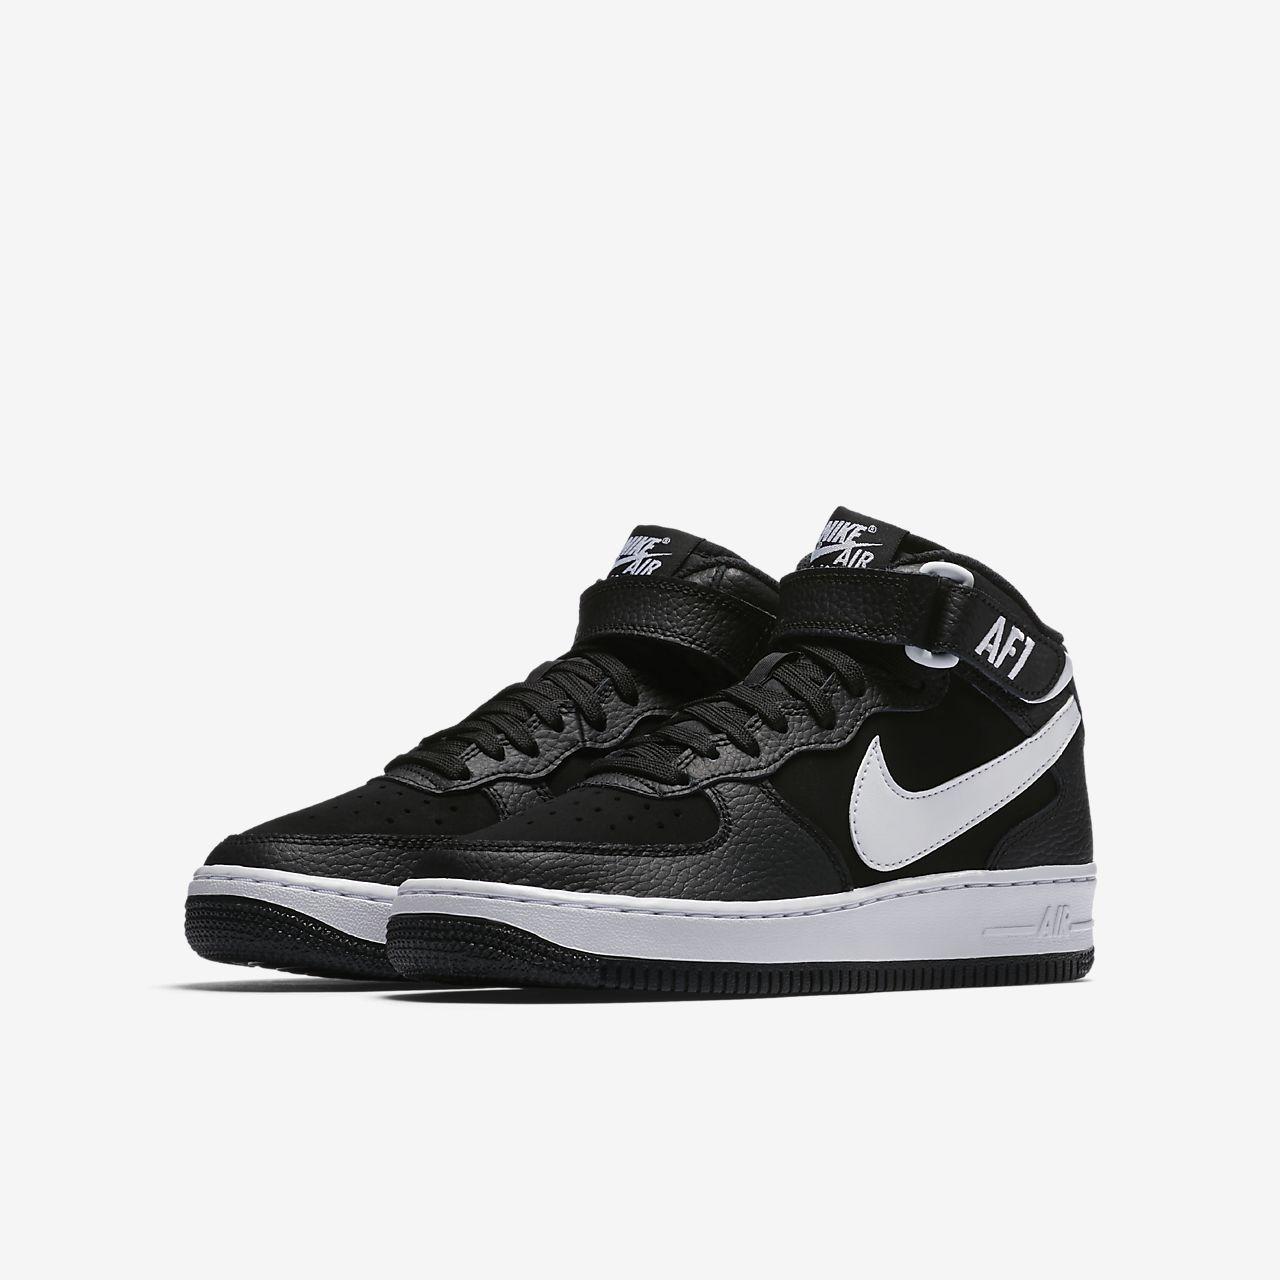 ... Nike Air Force 1 Mid 06 Schuh für ältere Kinder